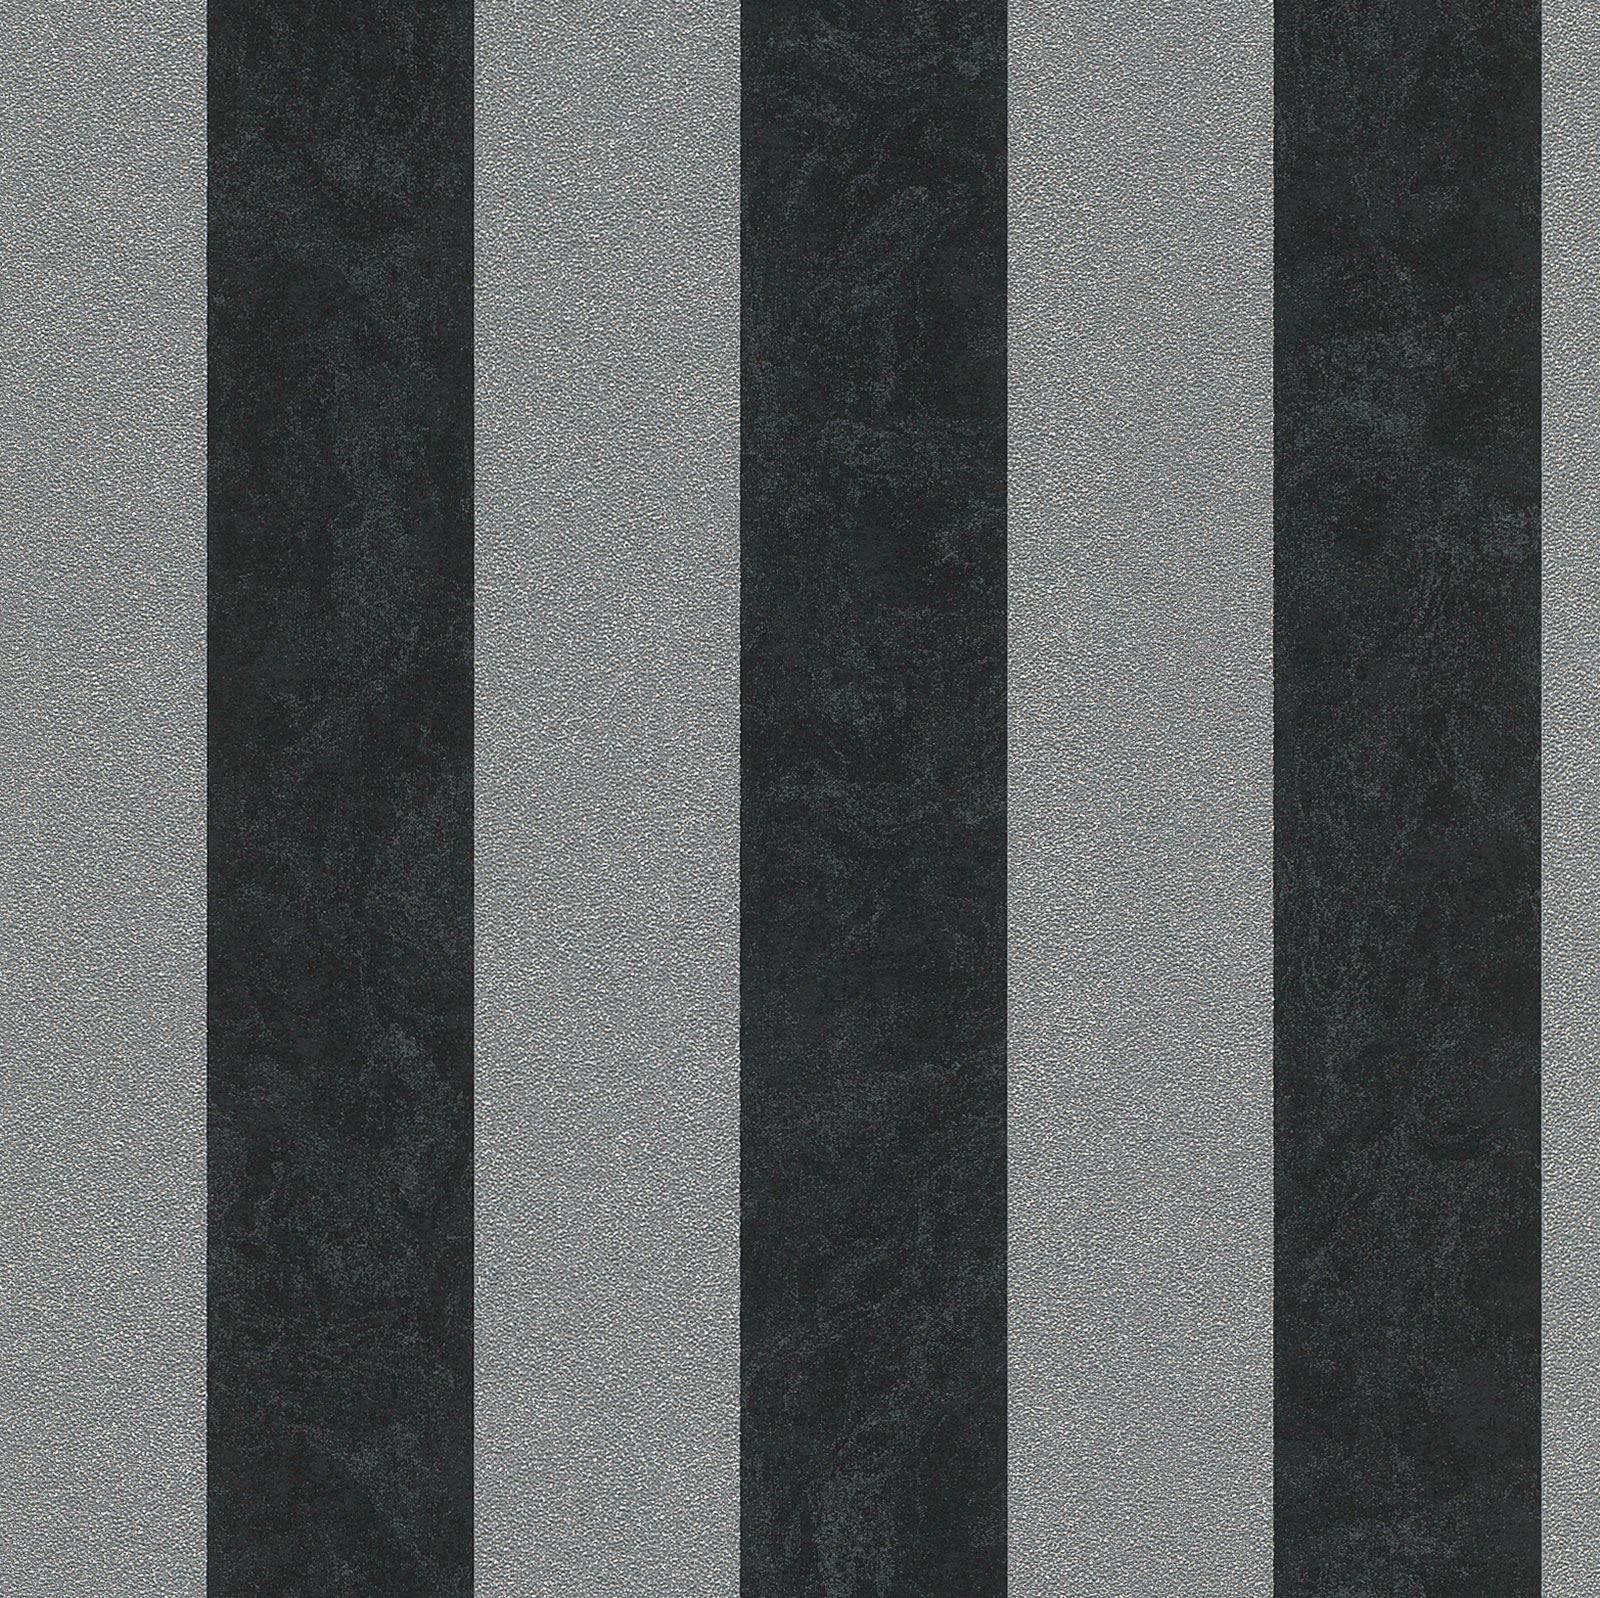 Ps Carat Silver Black Glitter Wallpaper Damask Stripe